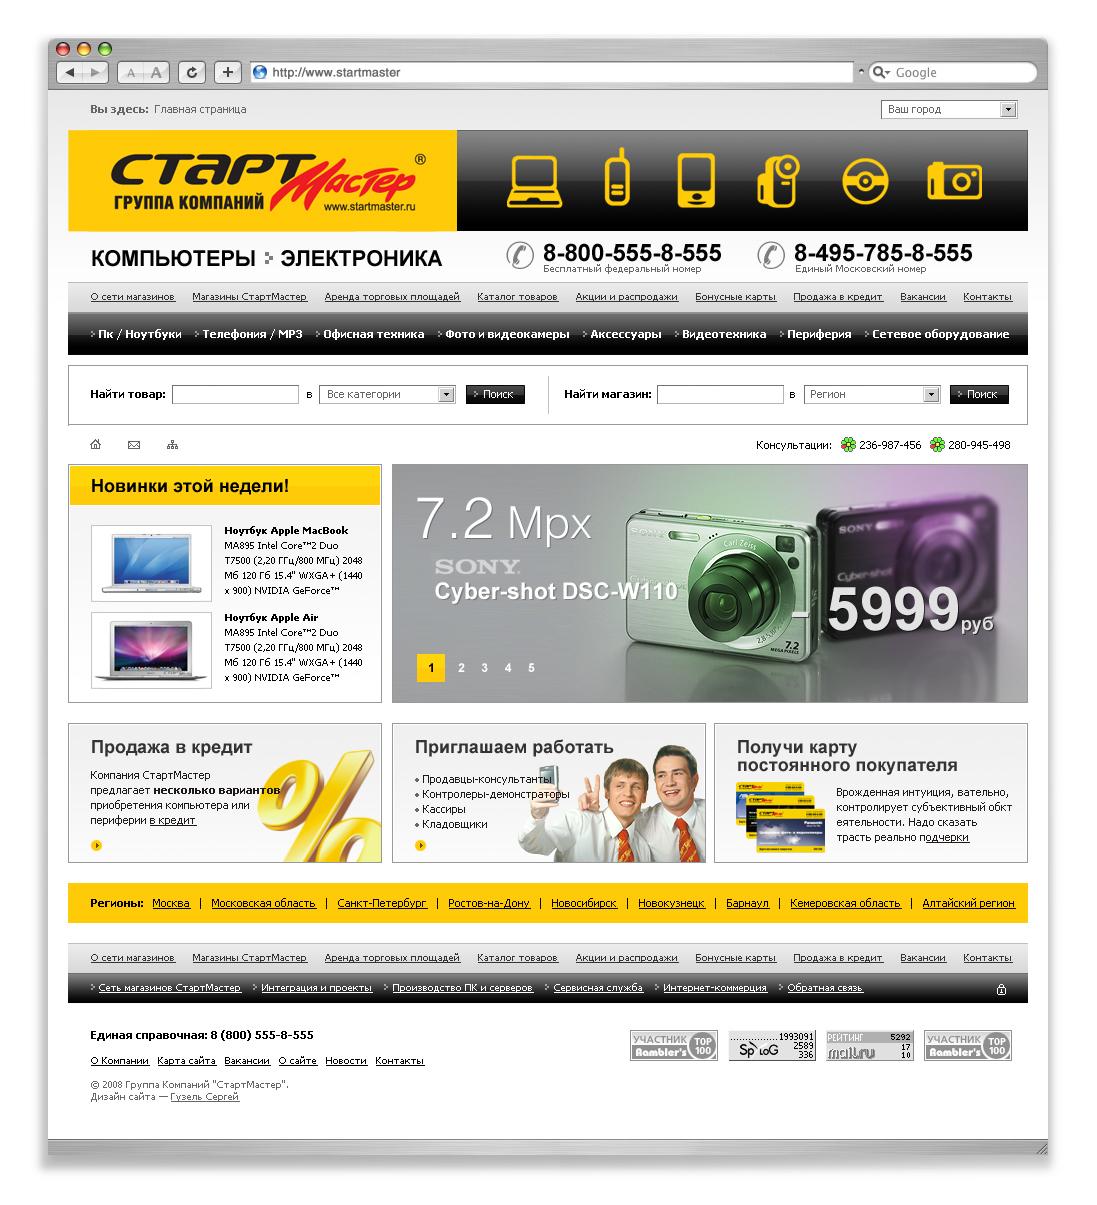 StartMaster